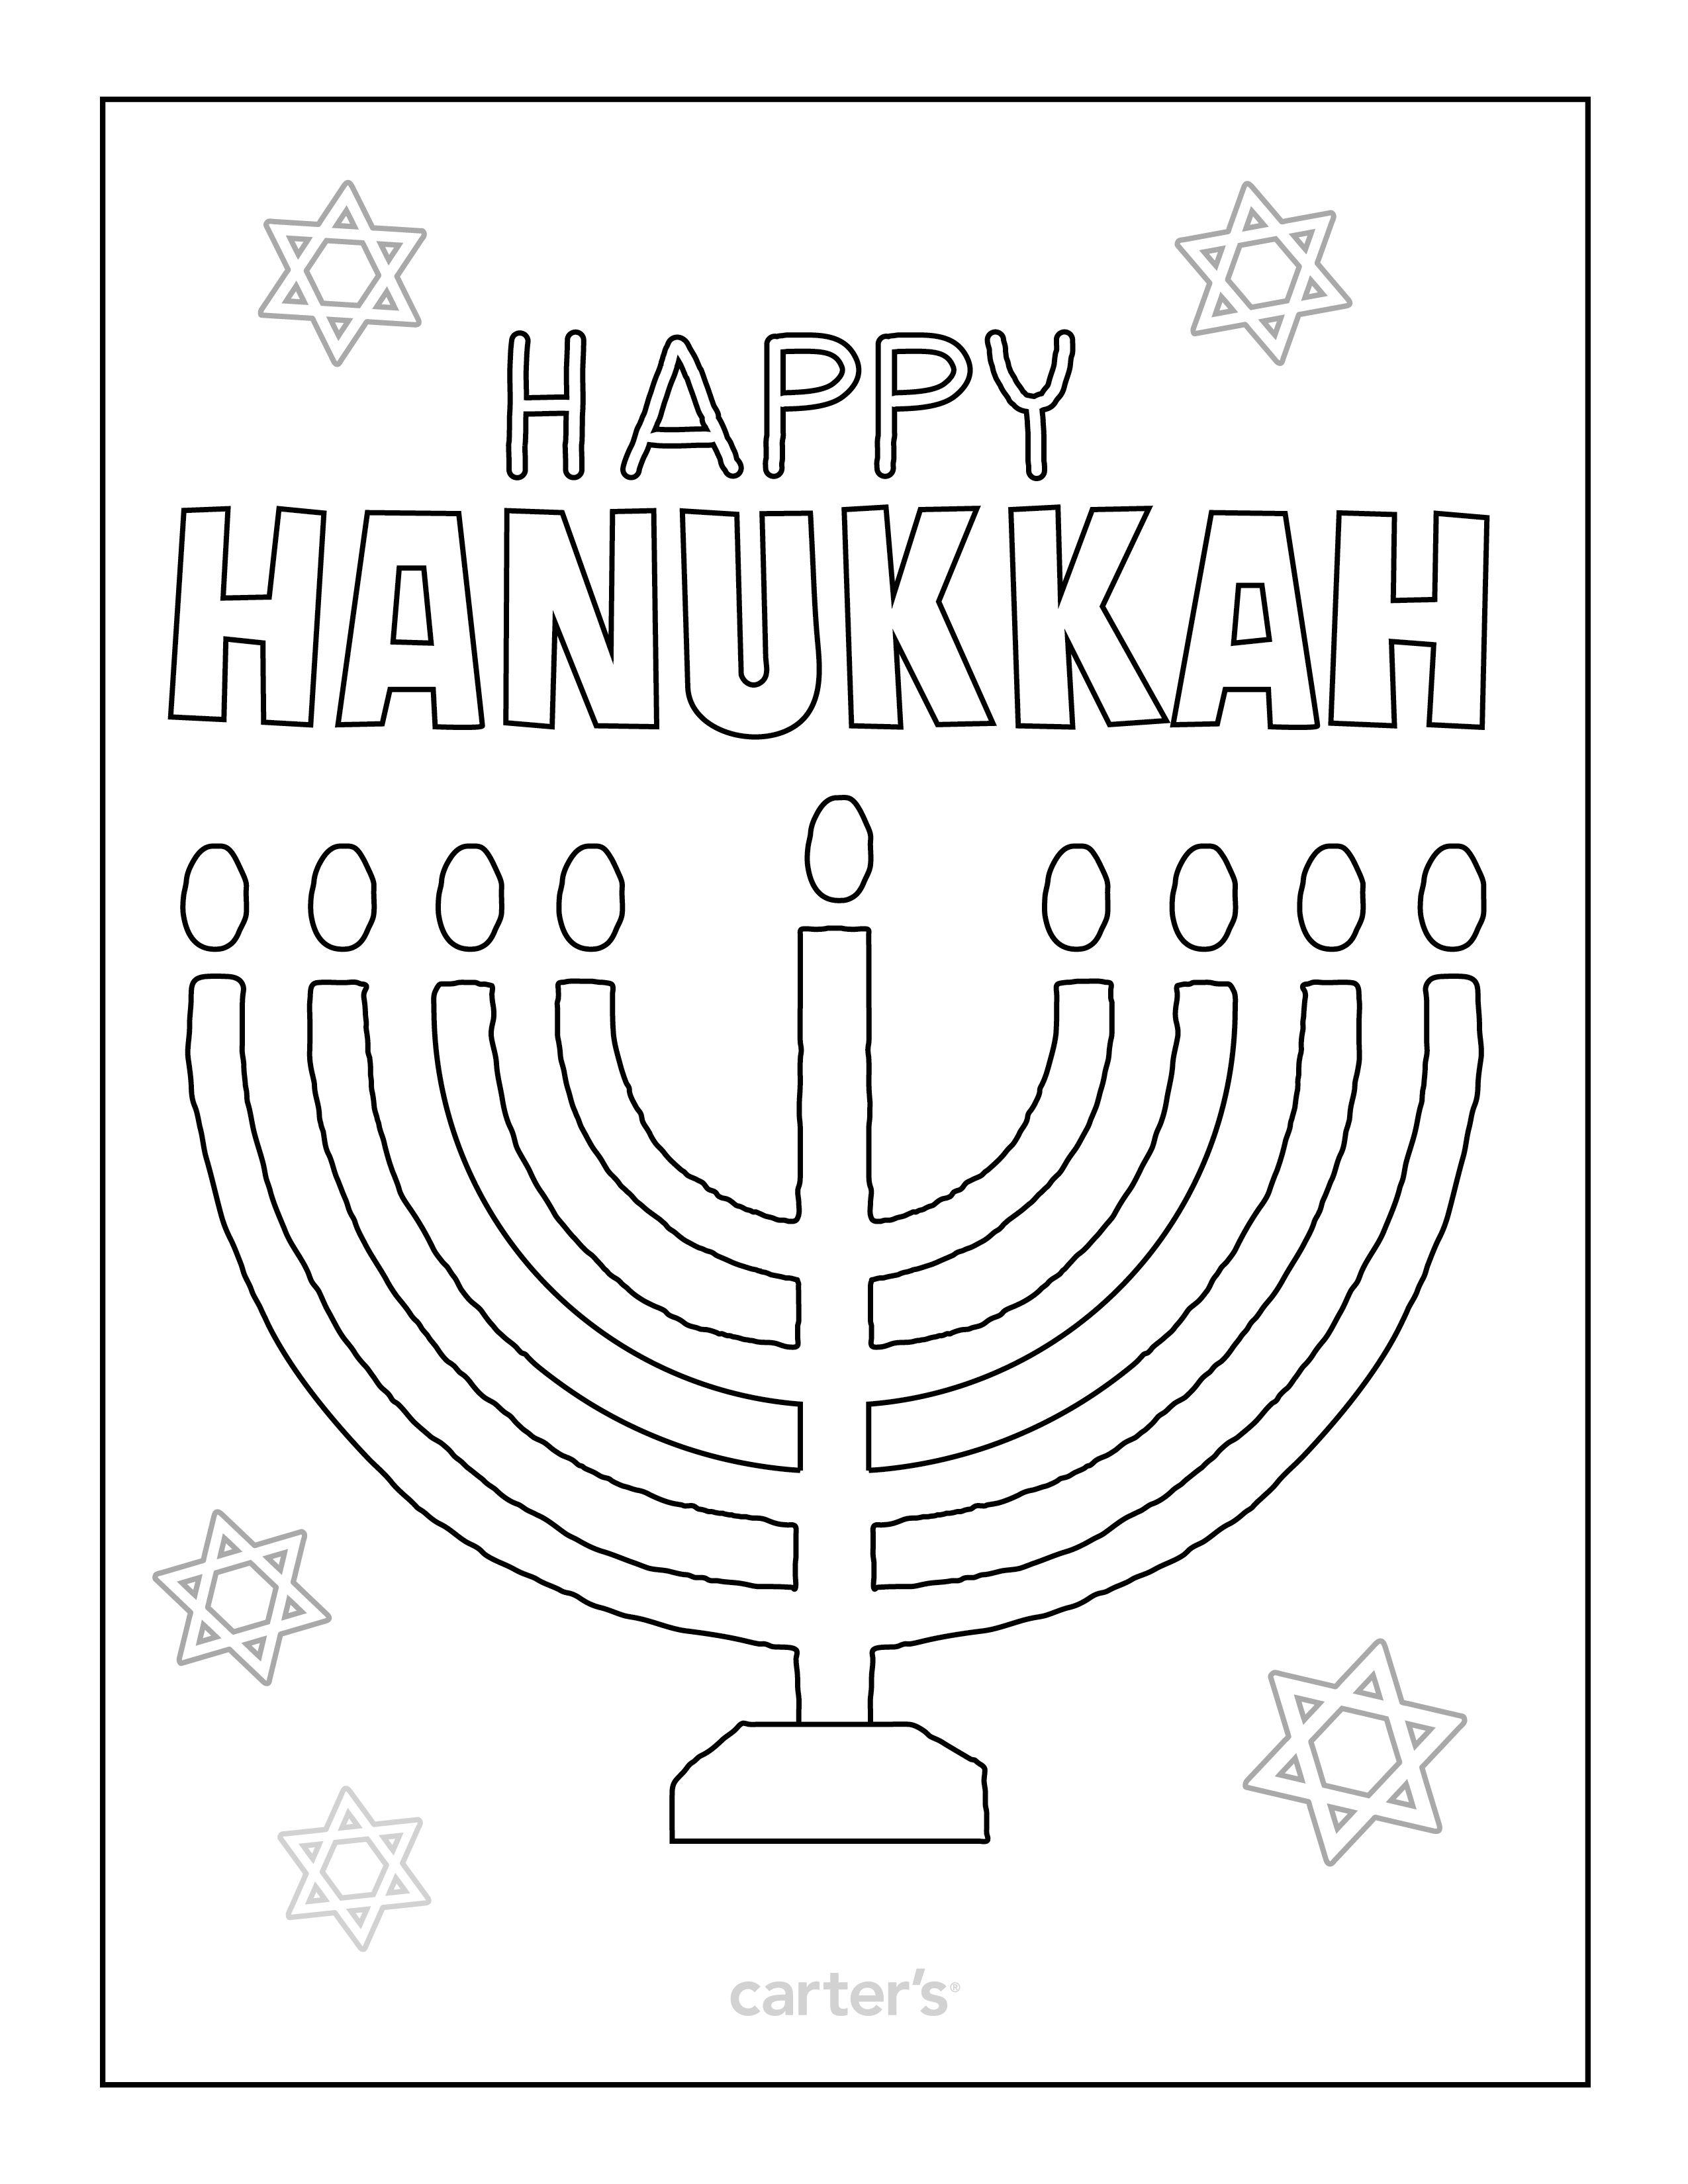 Sites Carters Site Hanukkah Hanukkah Preschool Hannukah Crafts [ 3300 x 2550 Pixel ]